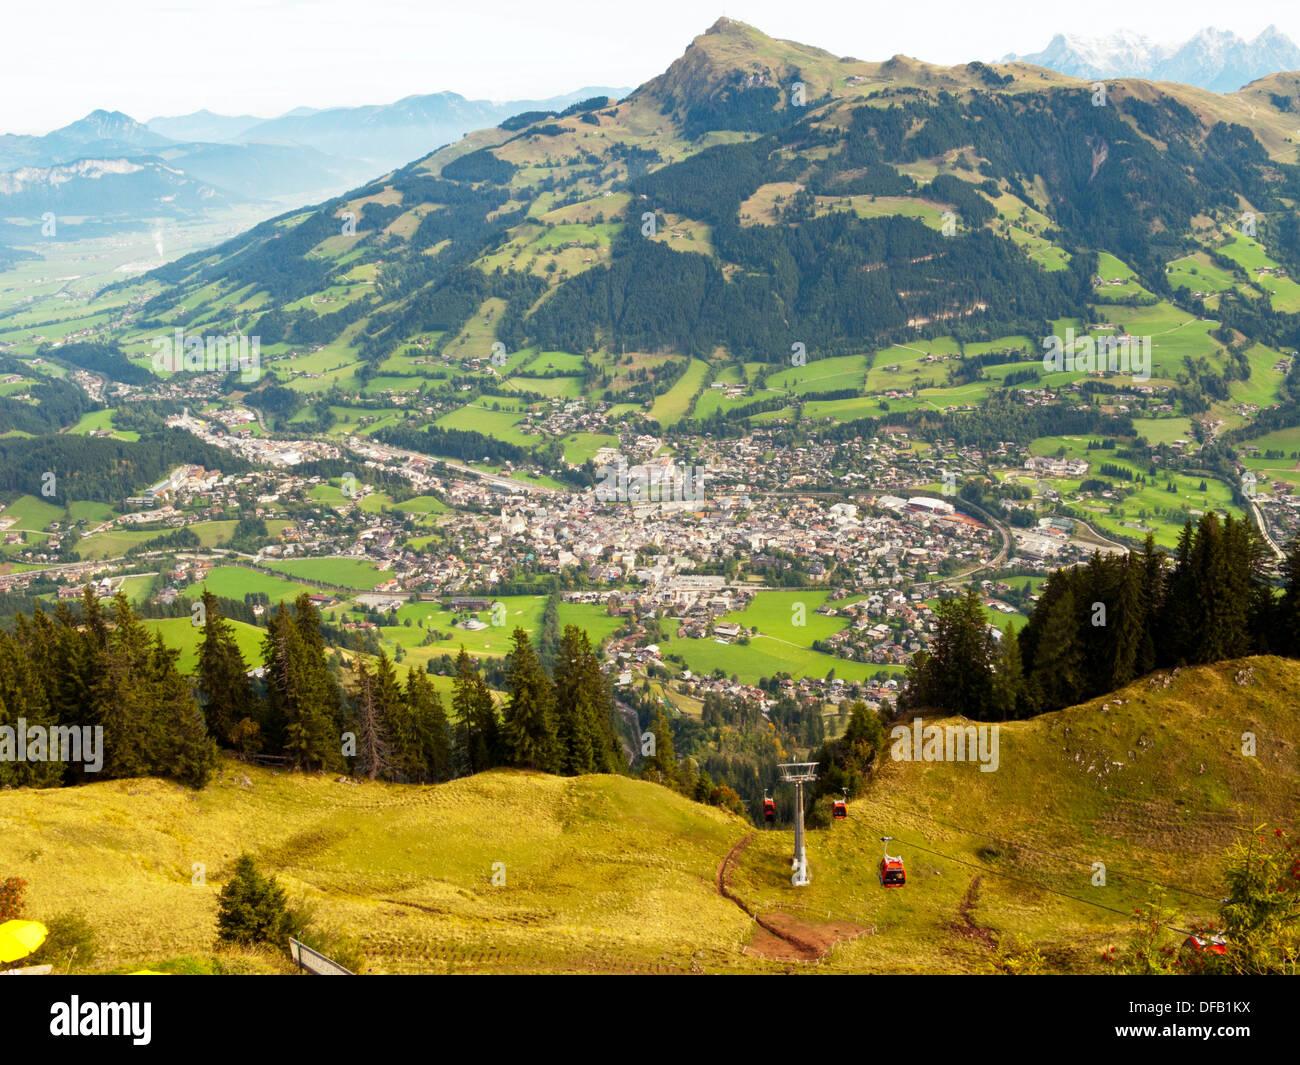 Summer looking down hahnenkamm ski run towards Austria kitzbuhel town at the bottom  Europe horn in background - Stock Image